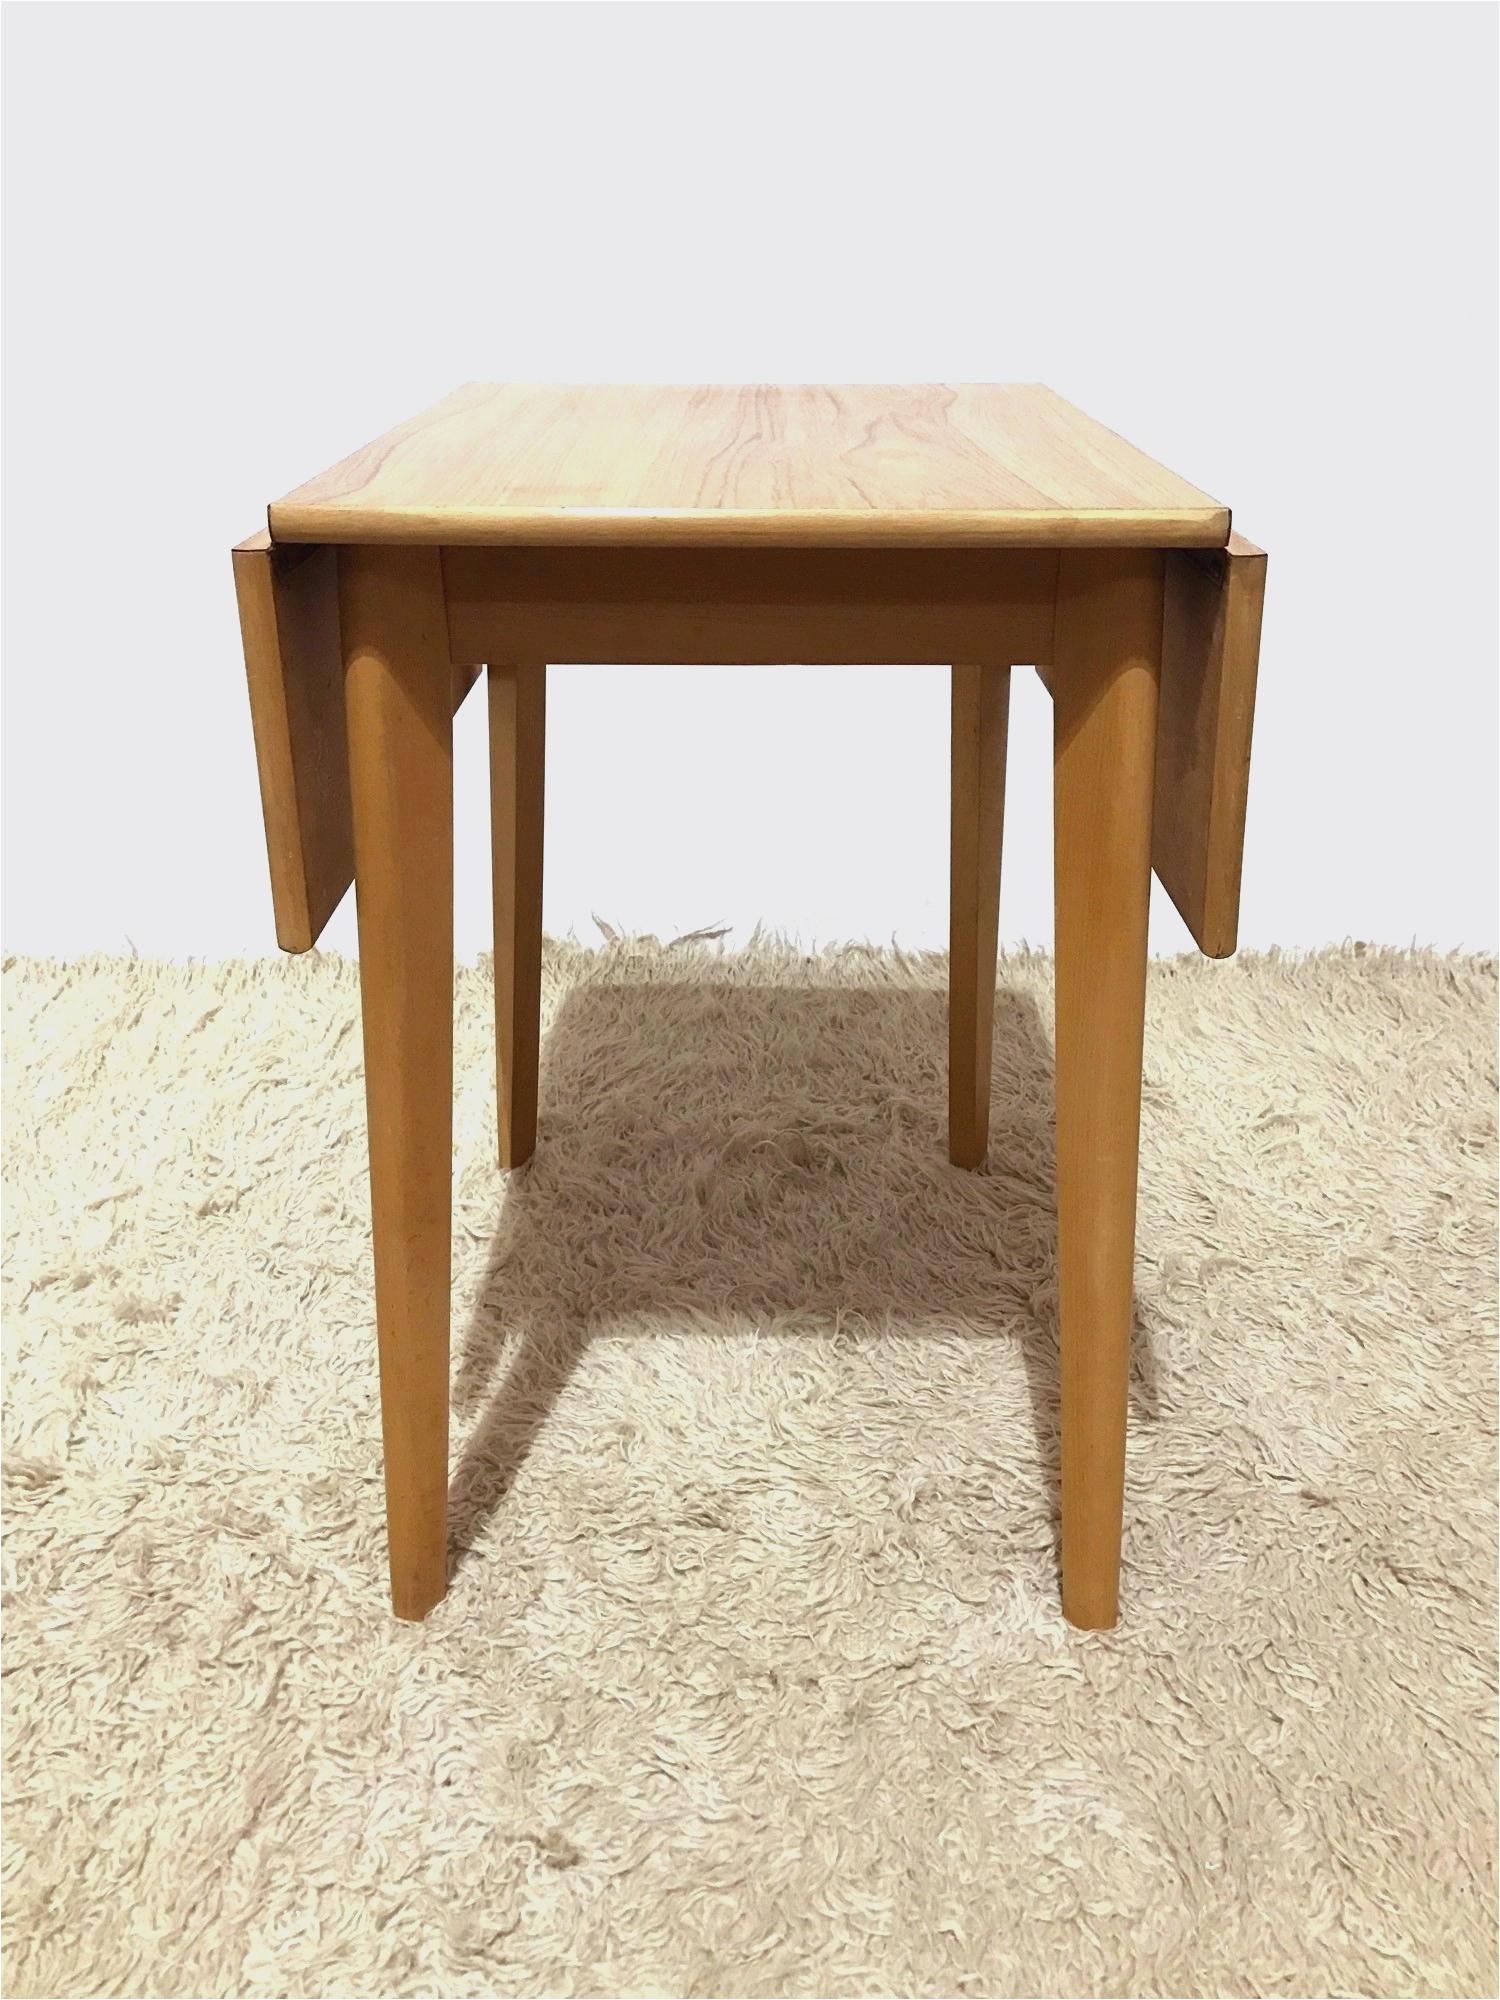 table de jardin chaises table jardin posite nouveau chaise table chaise table haute of table de jardin chaises